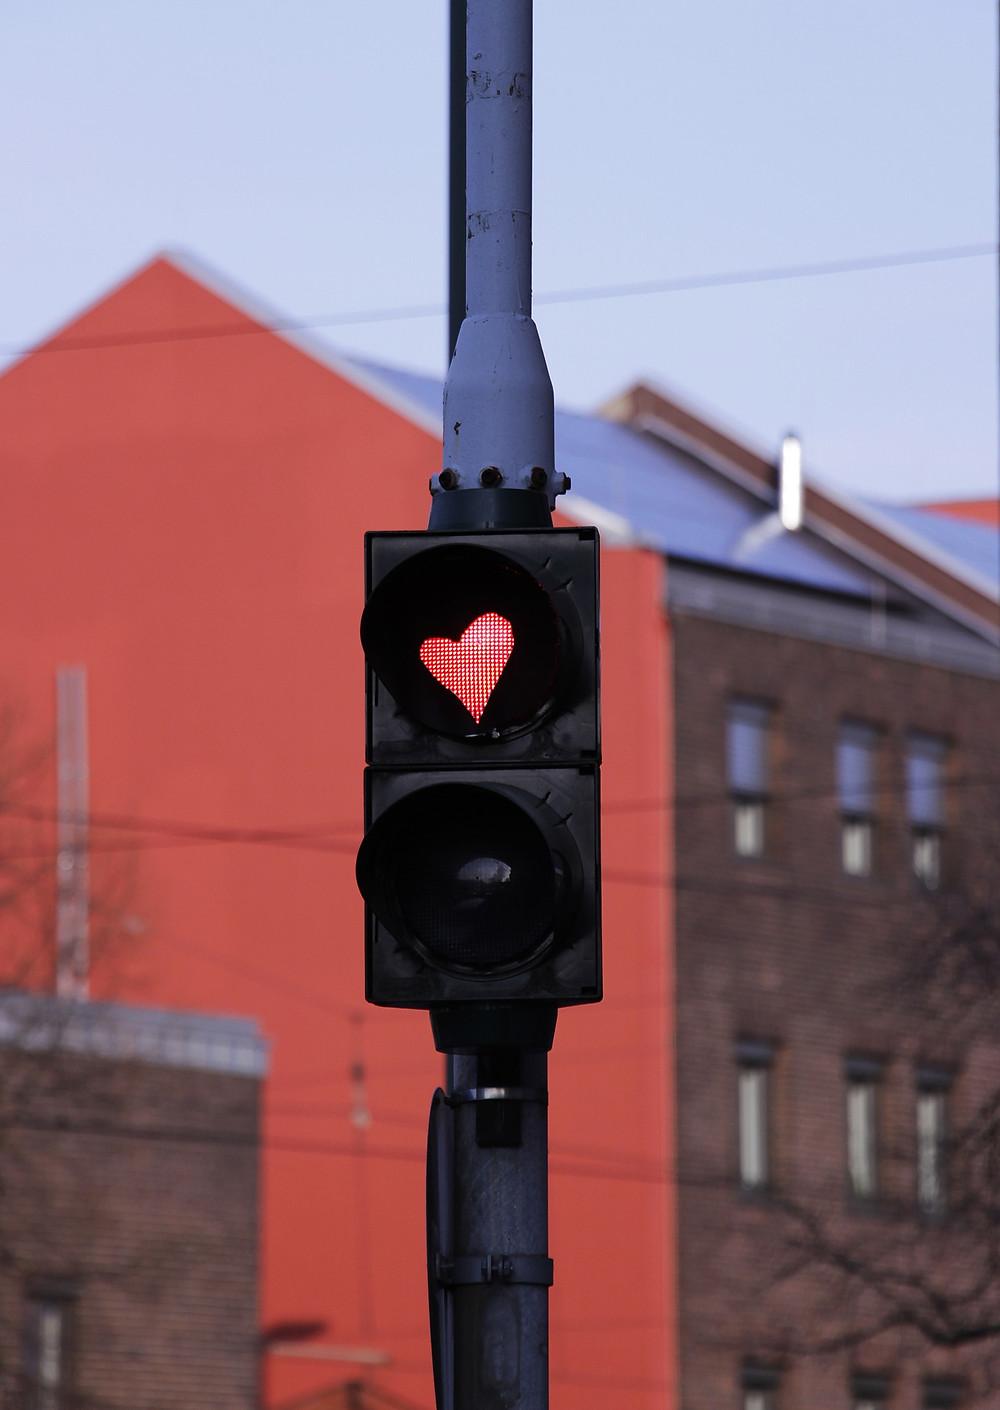 Love sign stop light heart